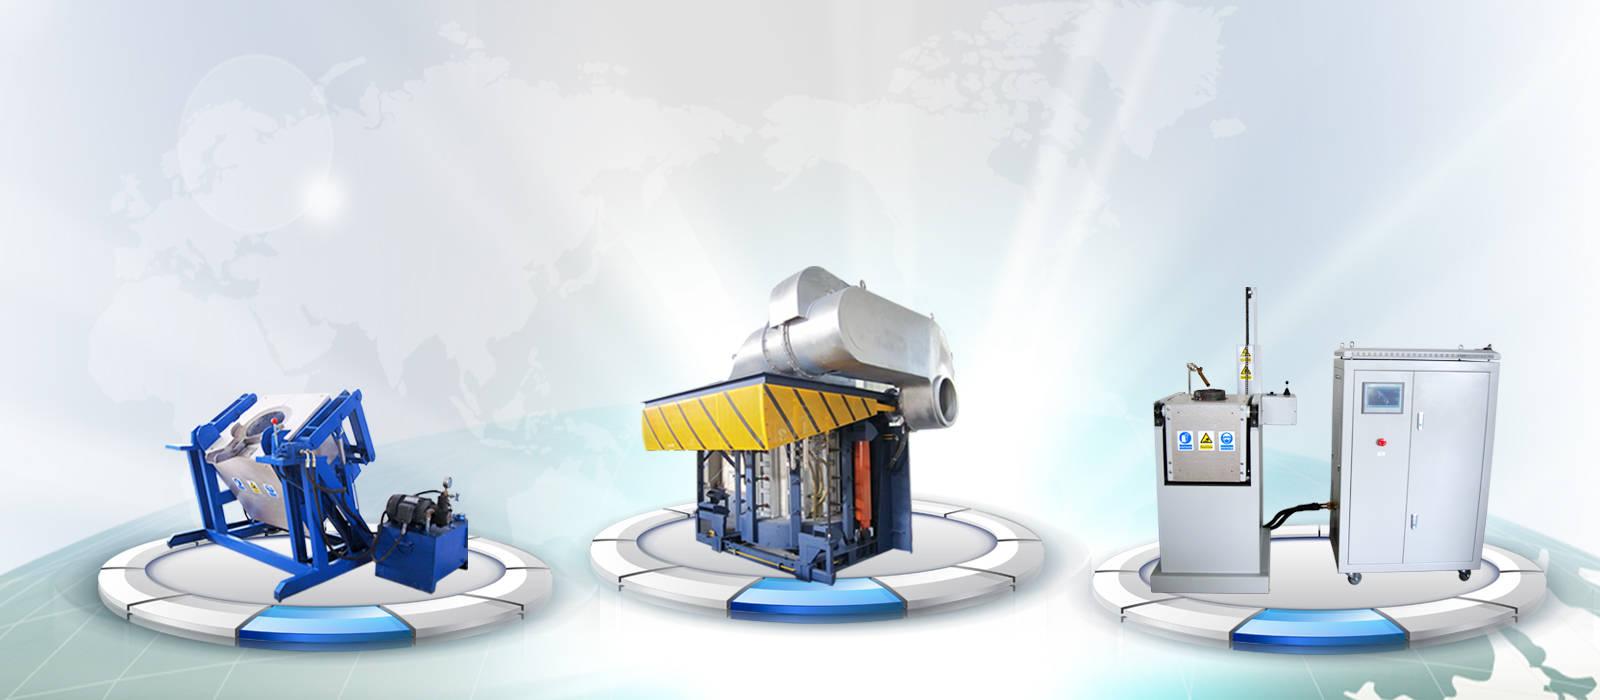 induction melting furnace display